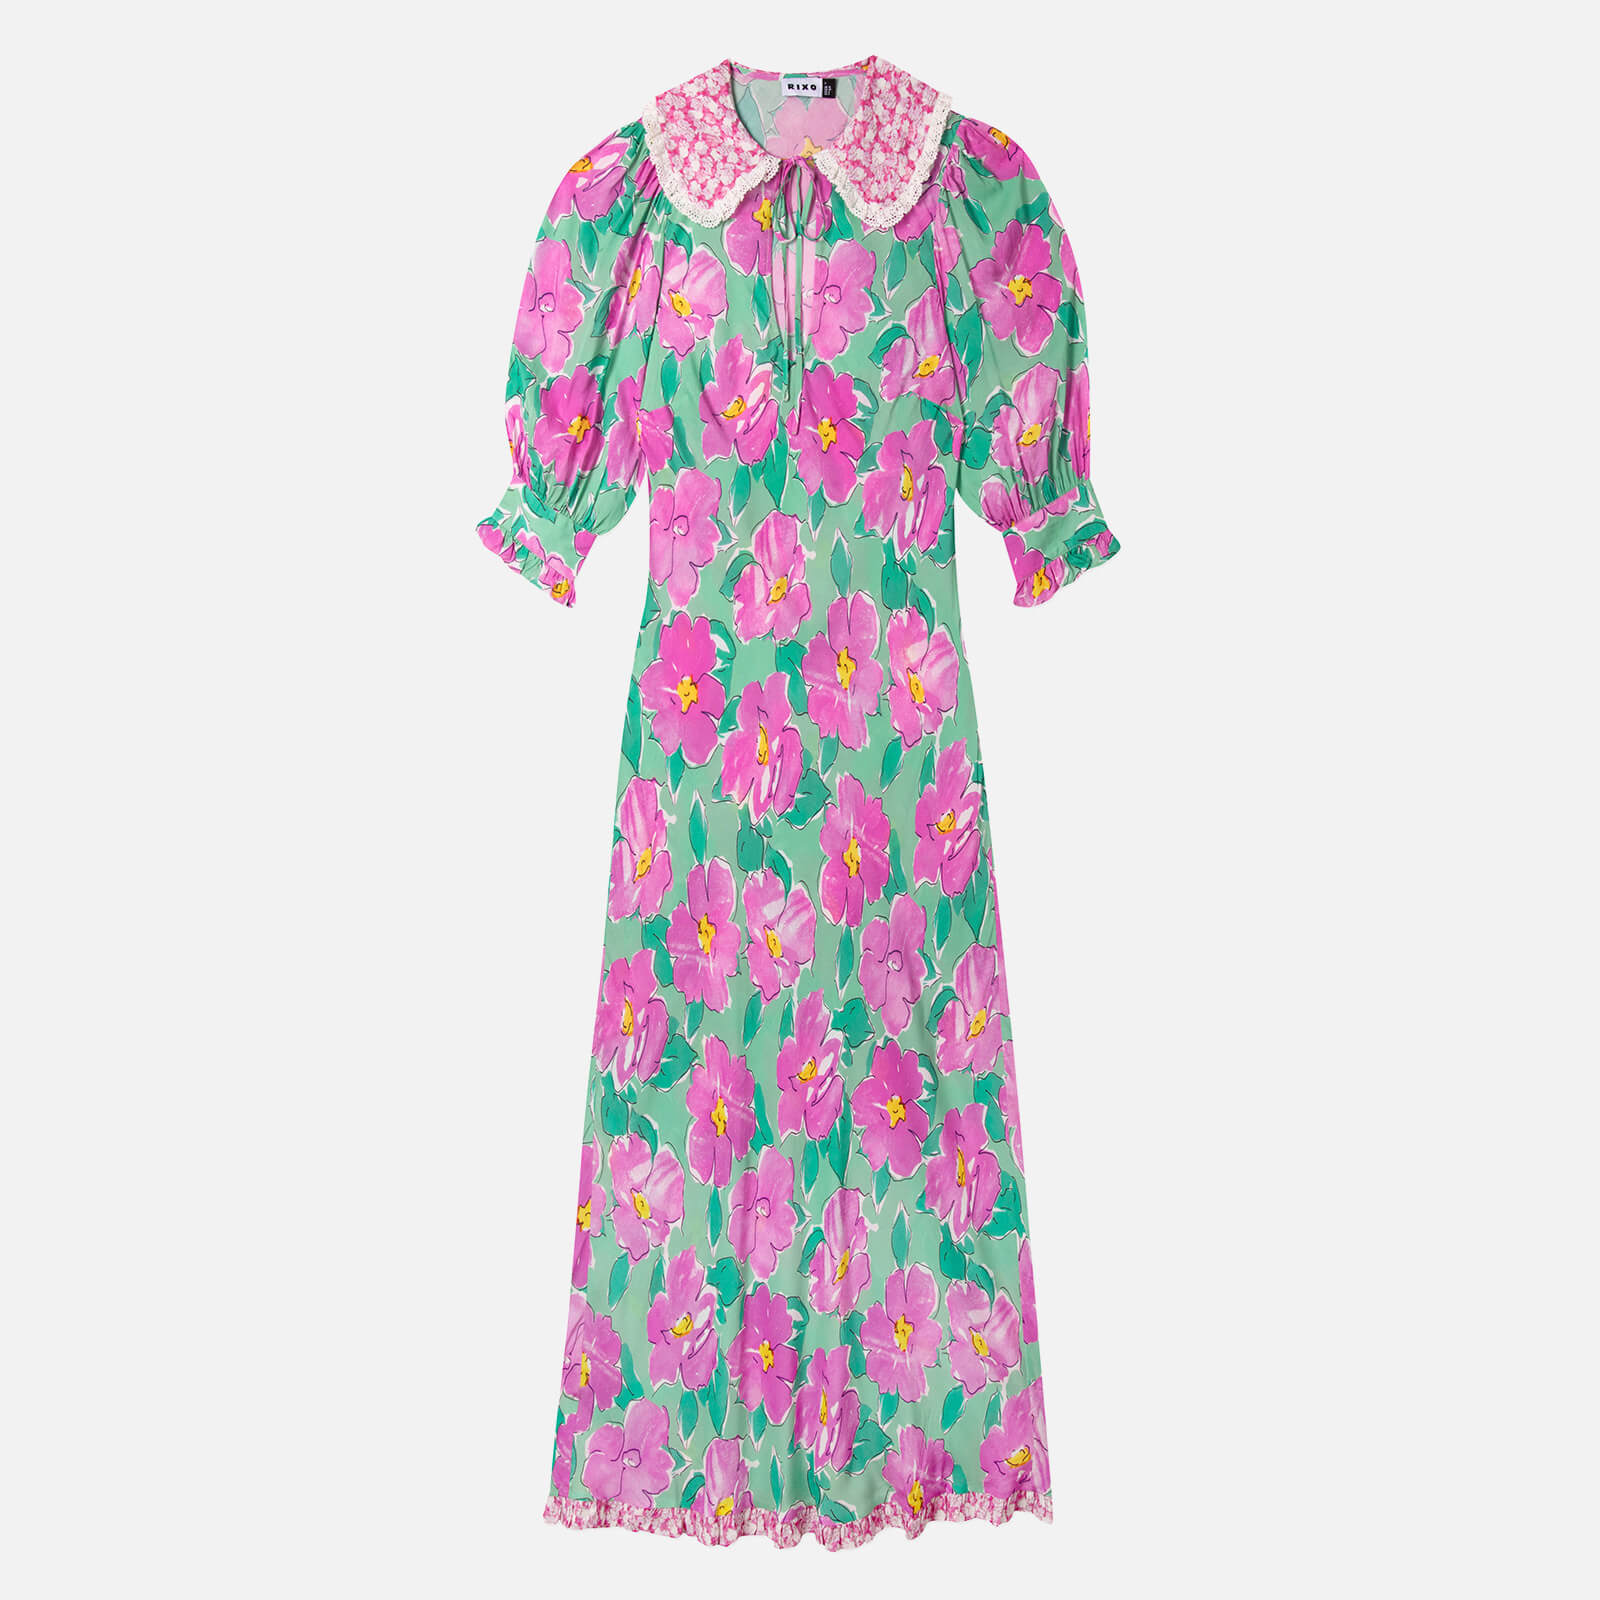 RIXO Women's Lauren Dress - Azalea Bloom Pink - XS